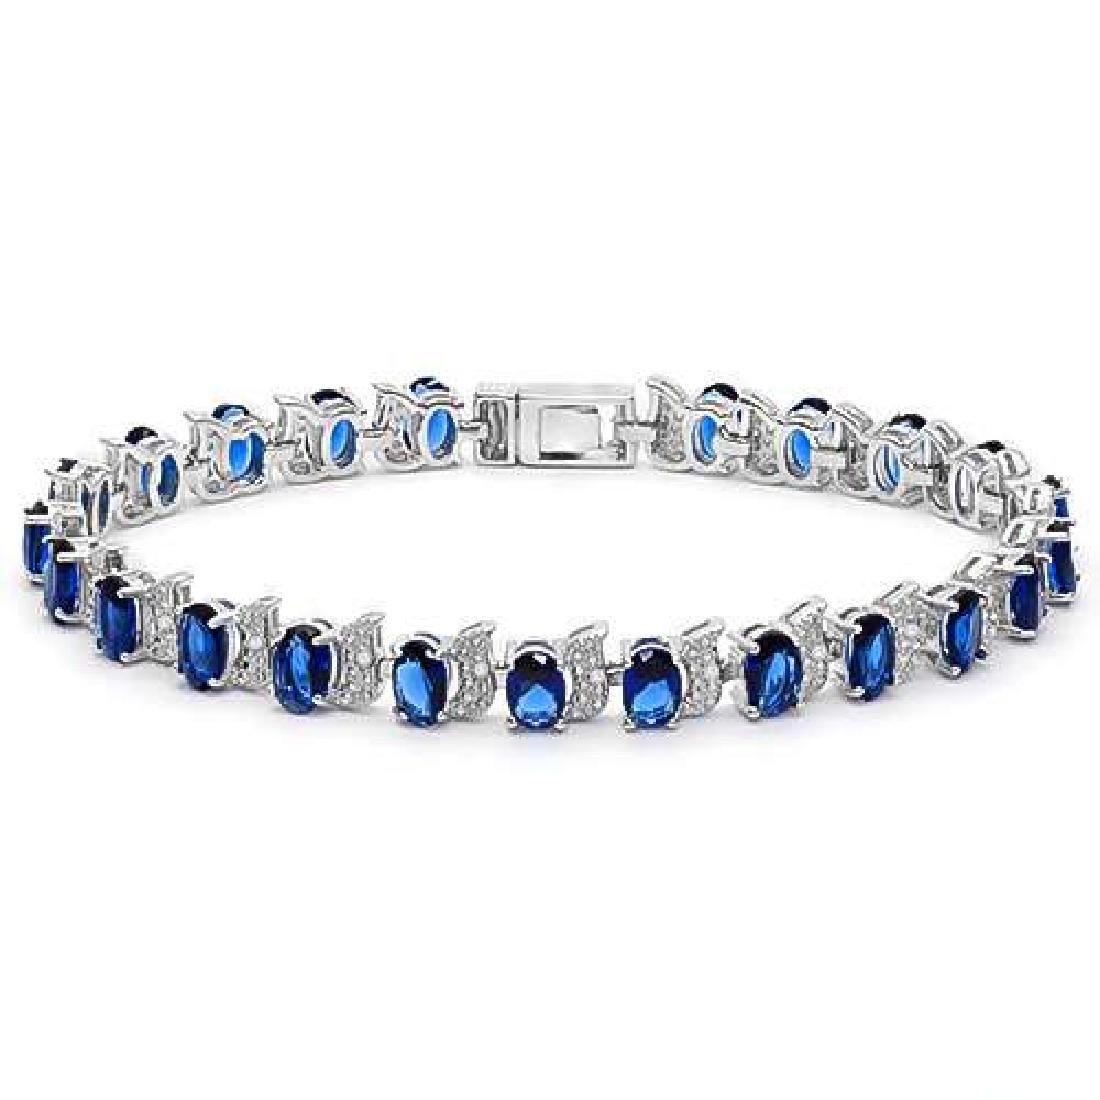 8.50 CTW CREATED BLUE SAPPHIRE & CREATED DIAMOND 925 ST